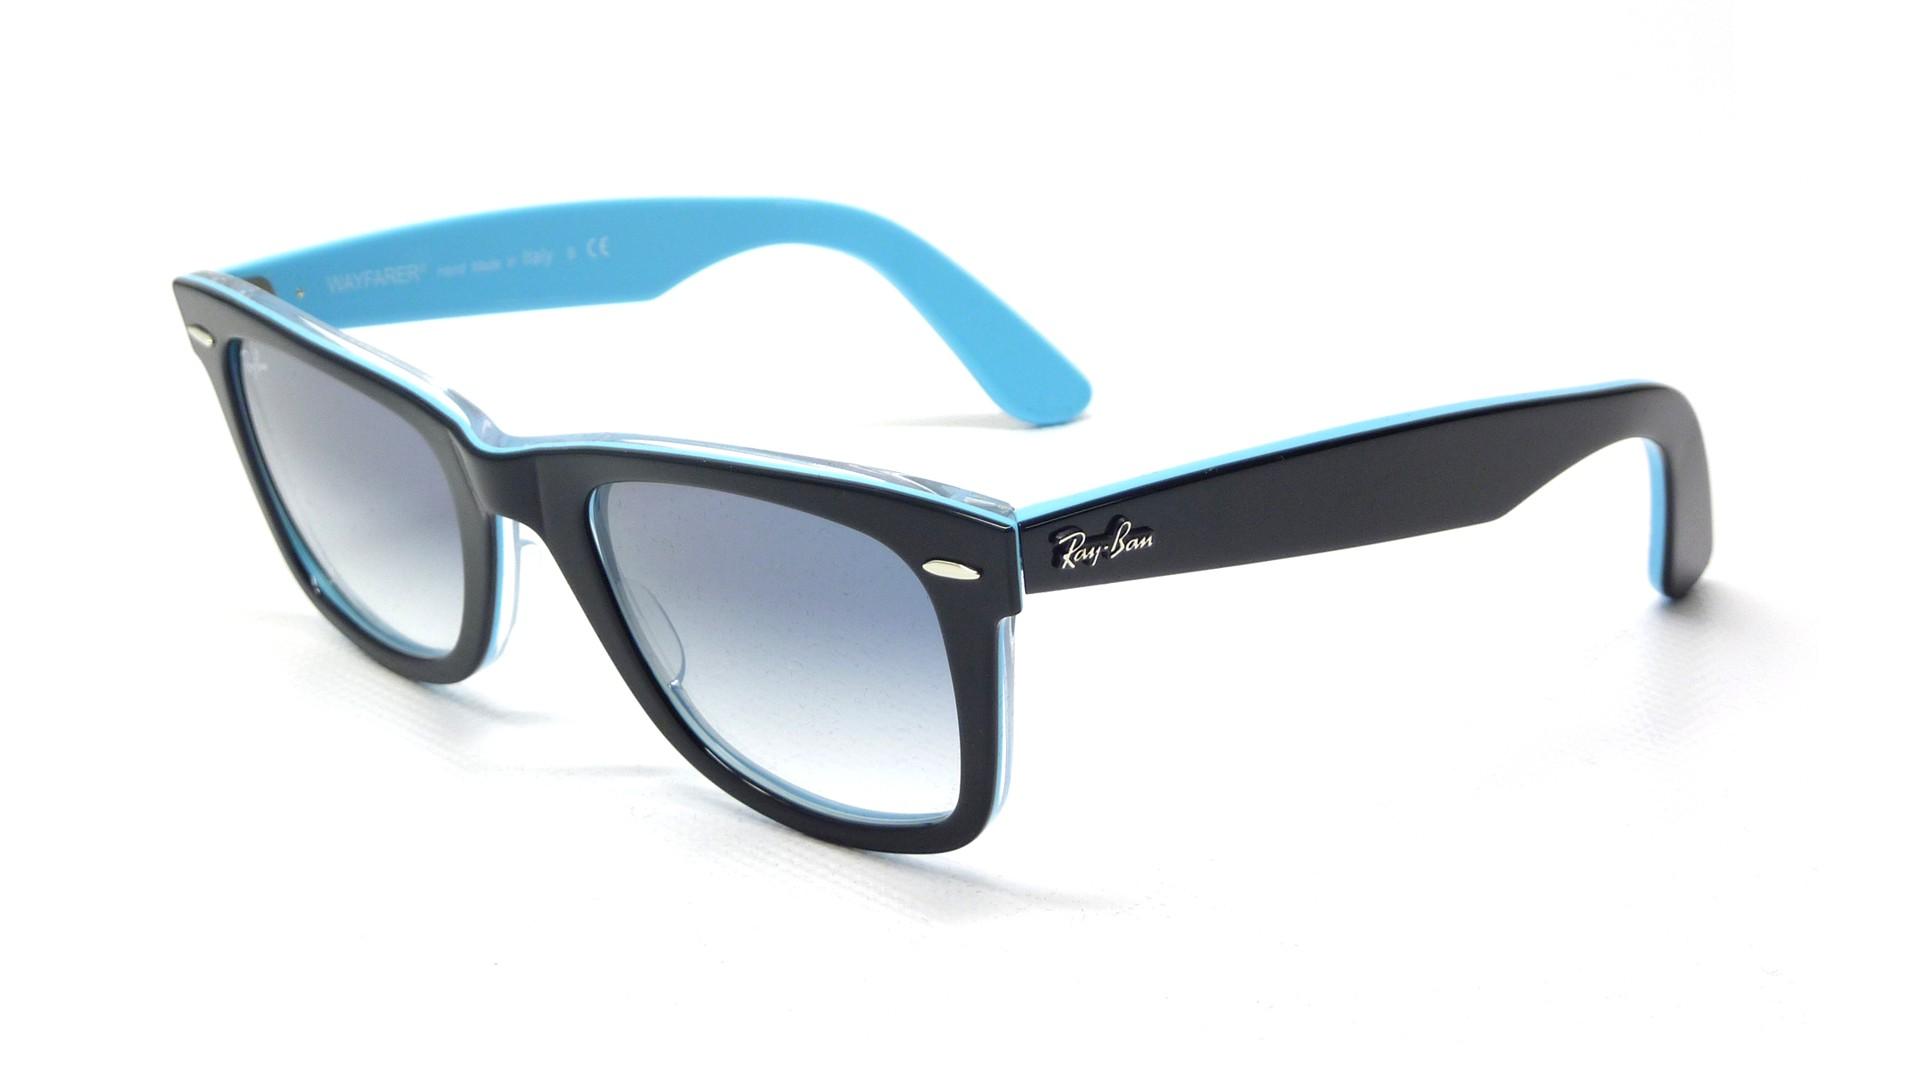 Ray-ban Glasses Black Blue Black Bumper .